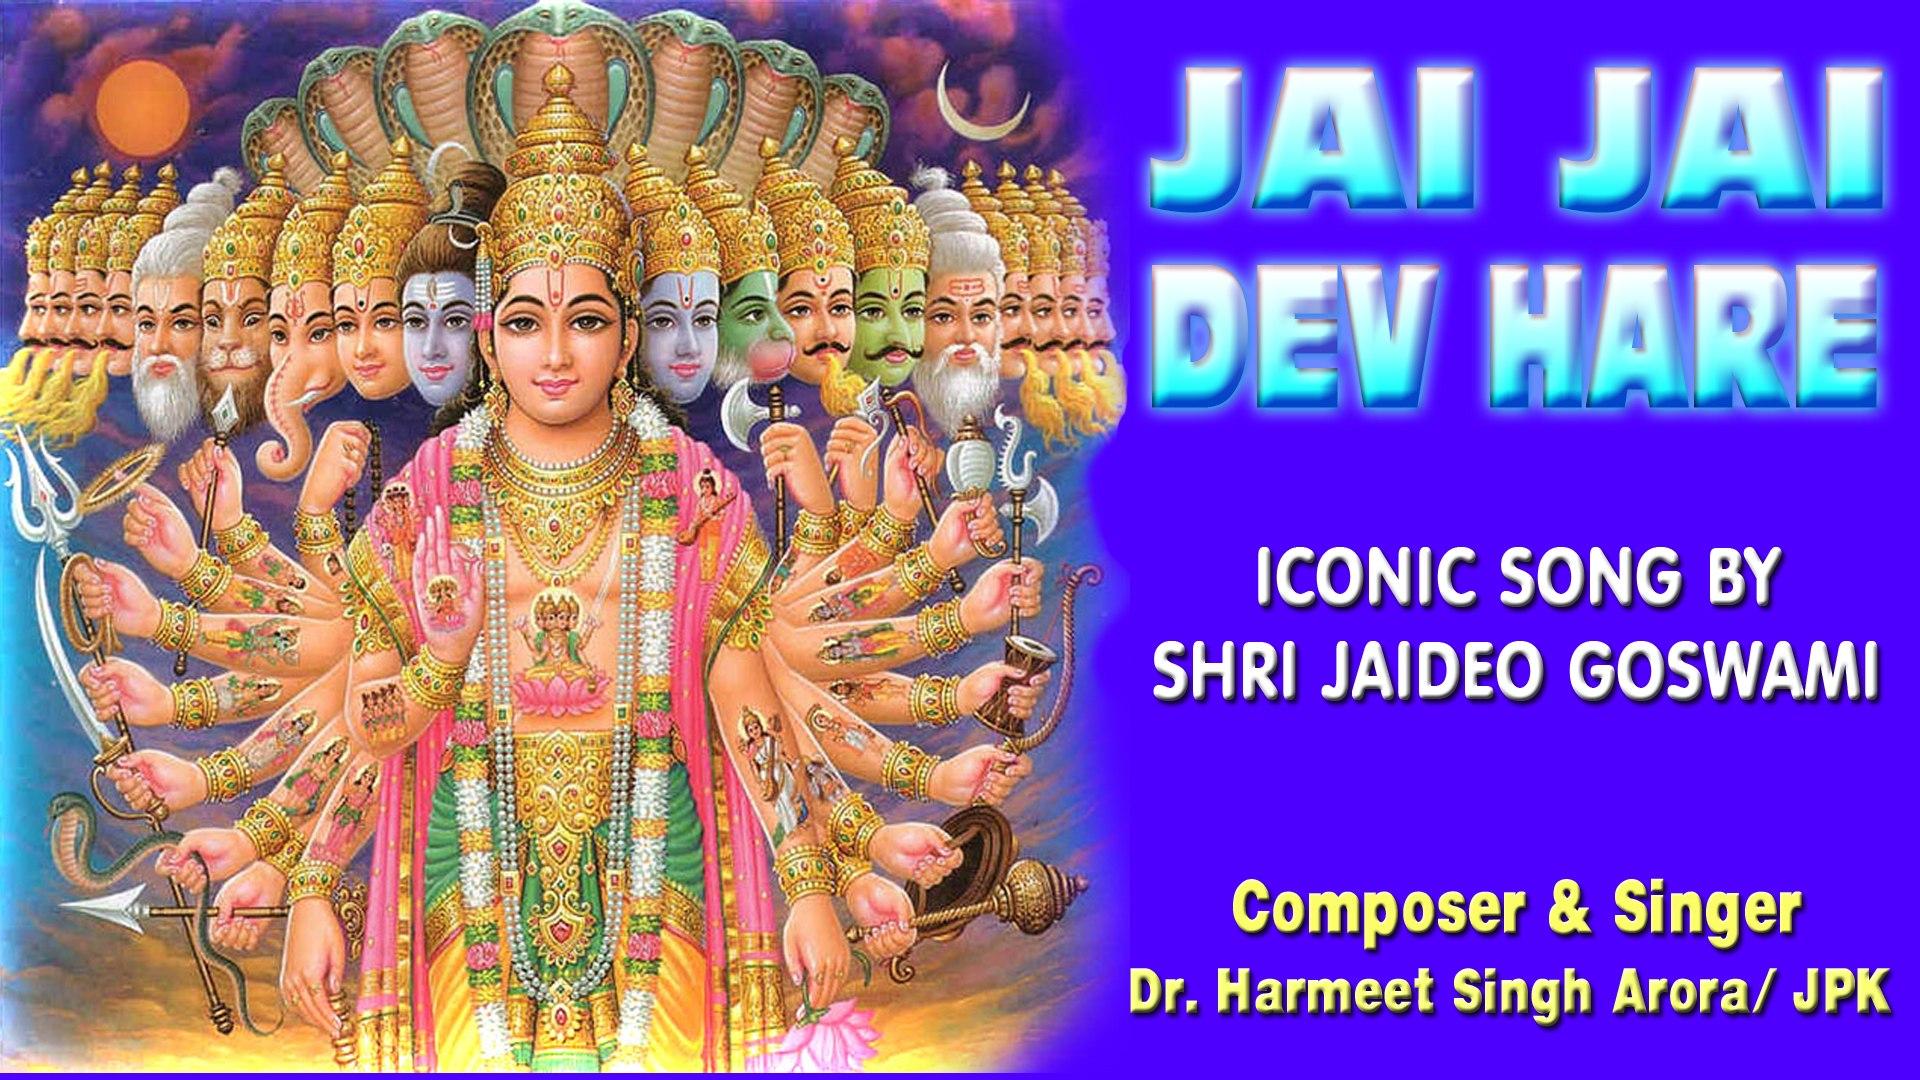 गीत गोविन्द - जय जय देव हरे   GEET GOVIND - JAI JAI DEV HARE   Iconic Verses by Sri Jaidev Goswami.